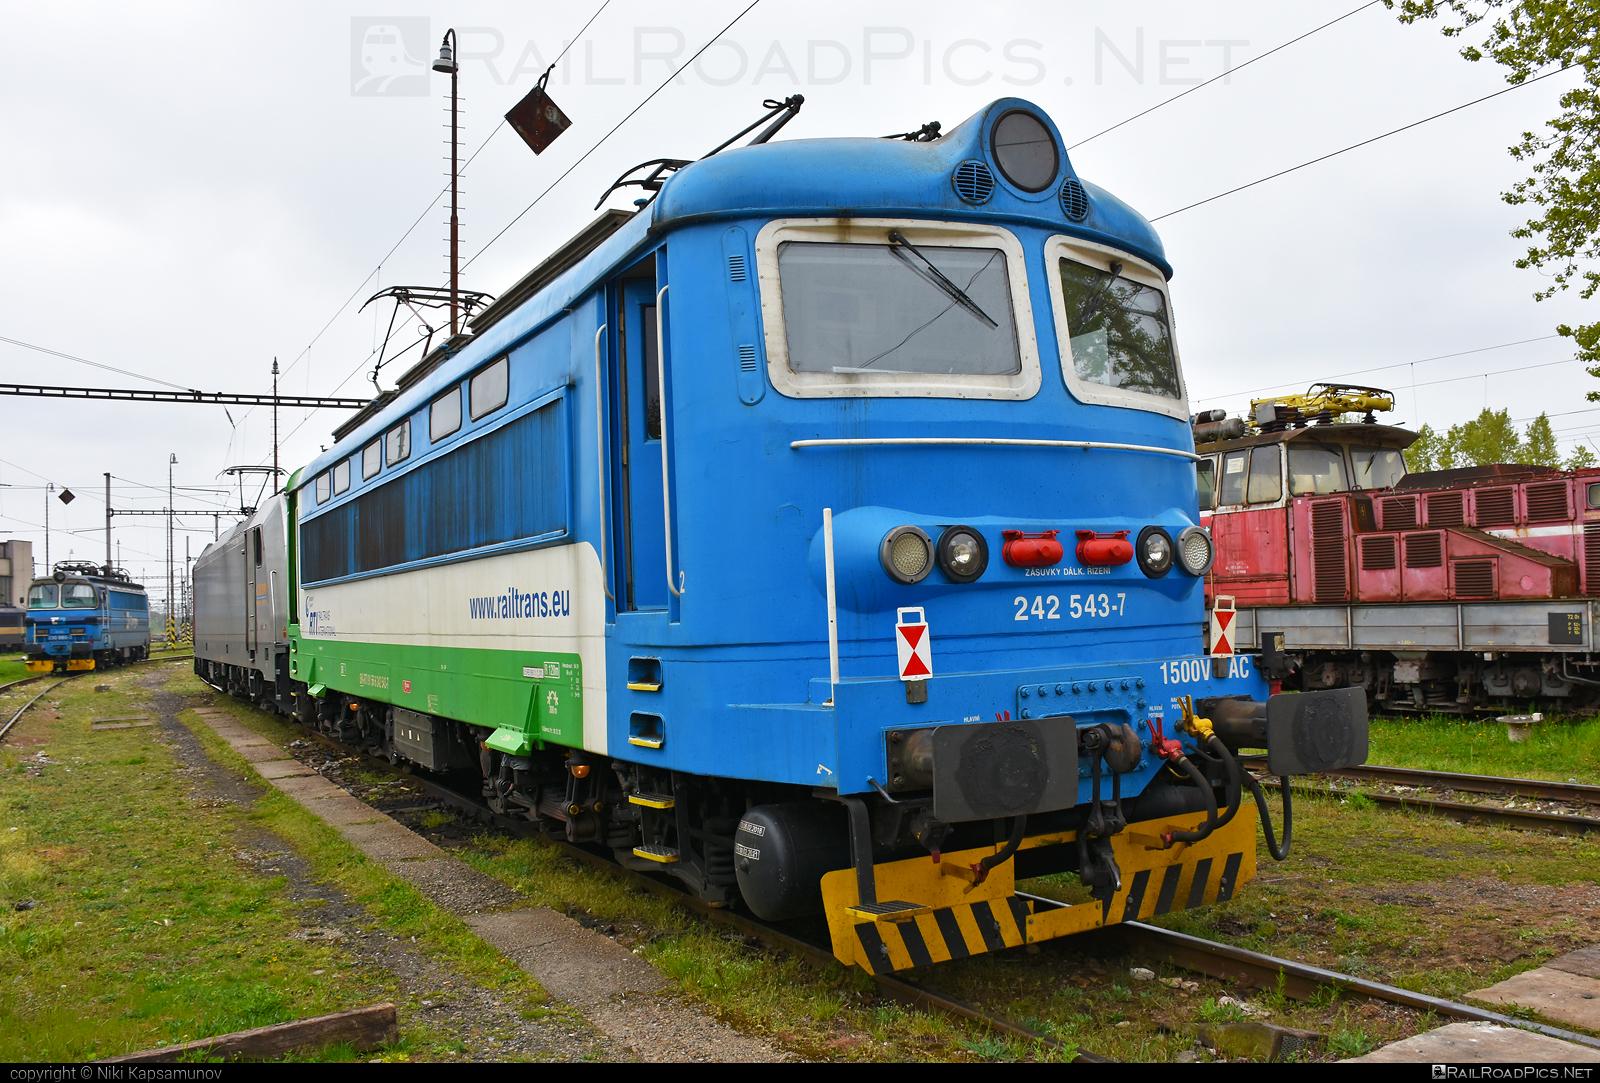 Škoda 64E - 242 543-7 operated by Railtrans International, s.r.o #BDZclass43 #RailtransInternational #plechac #rti #skoda #skoda64e